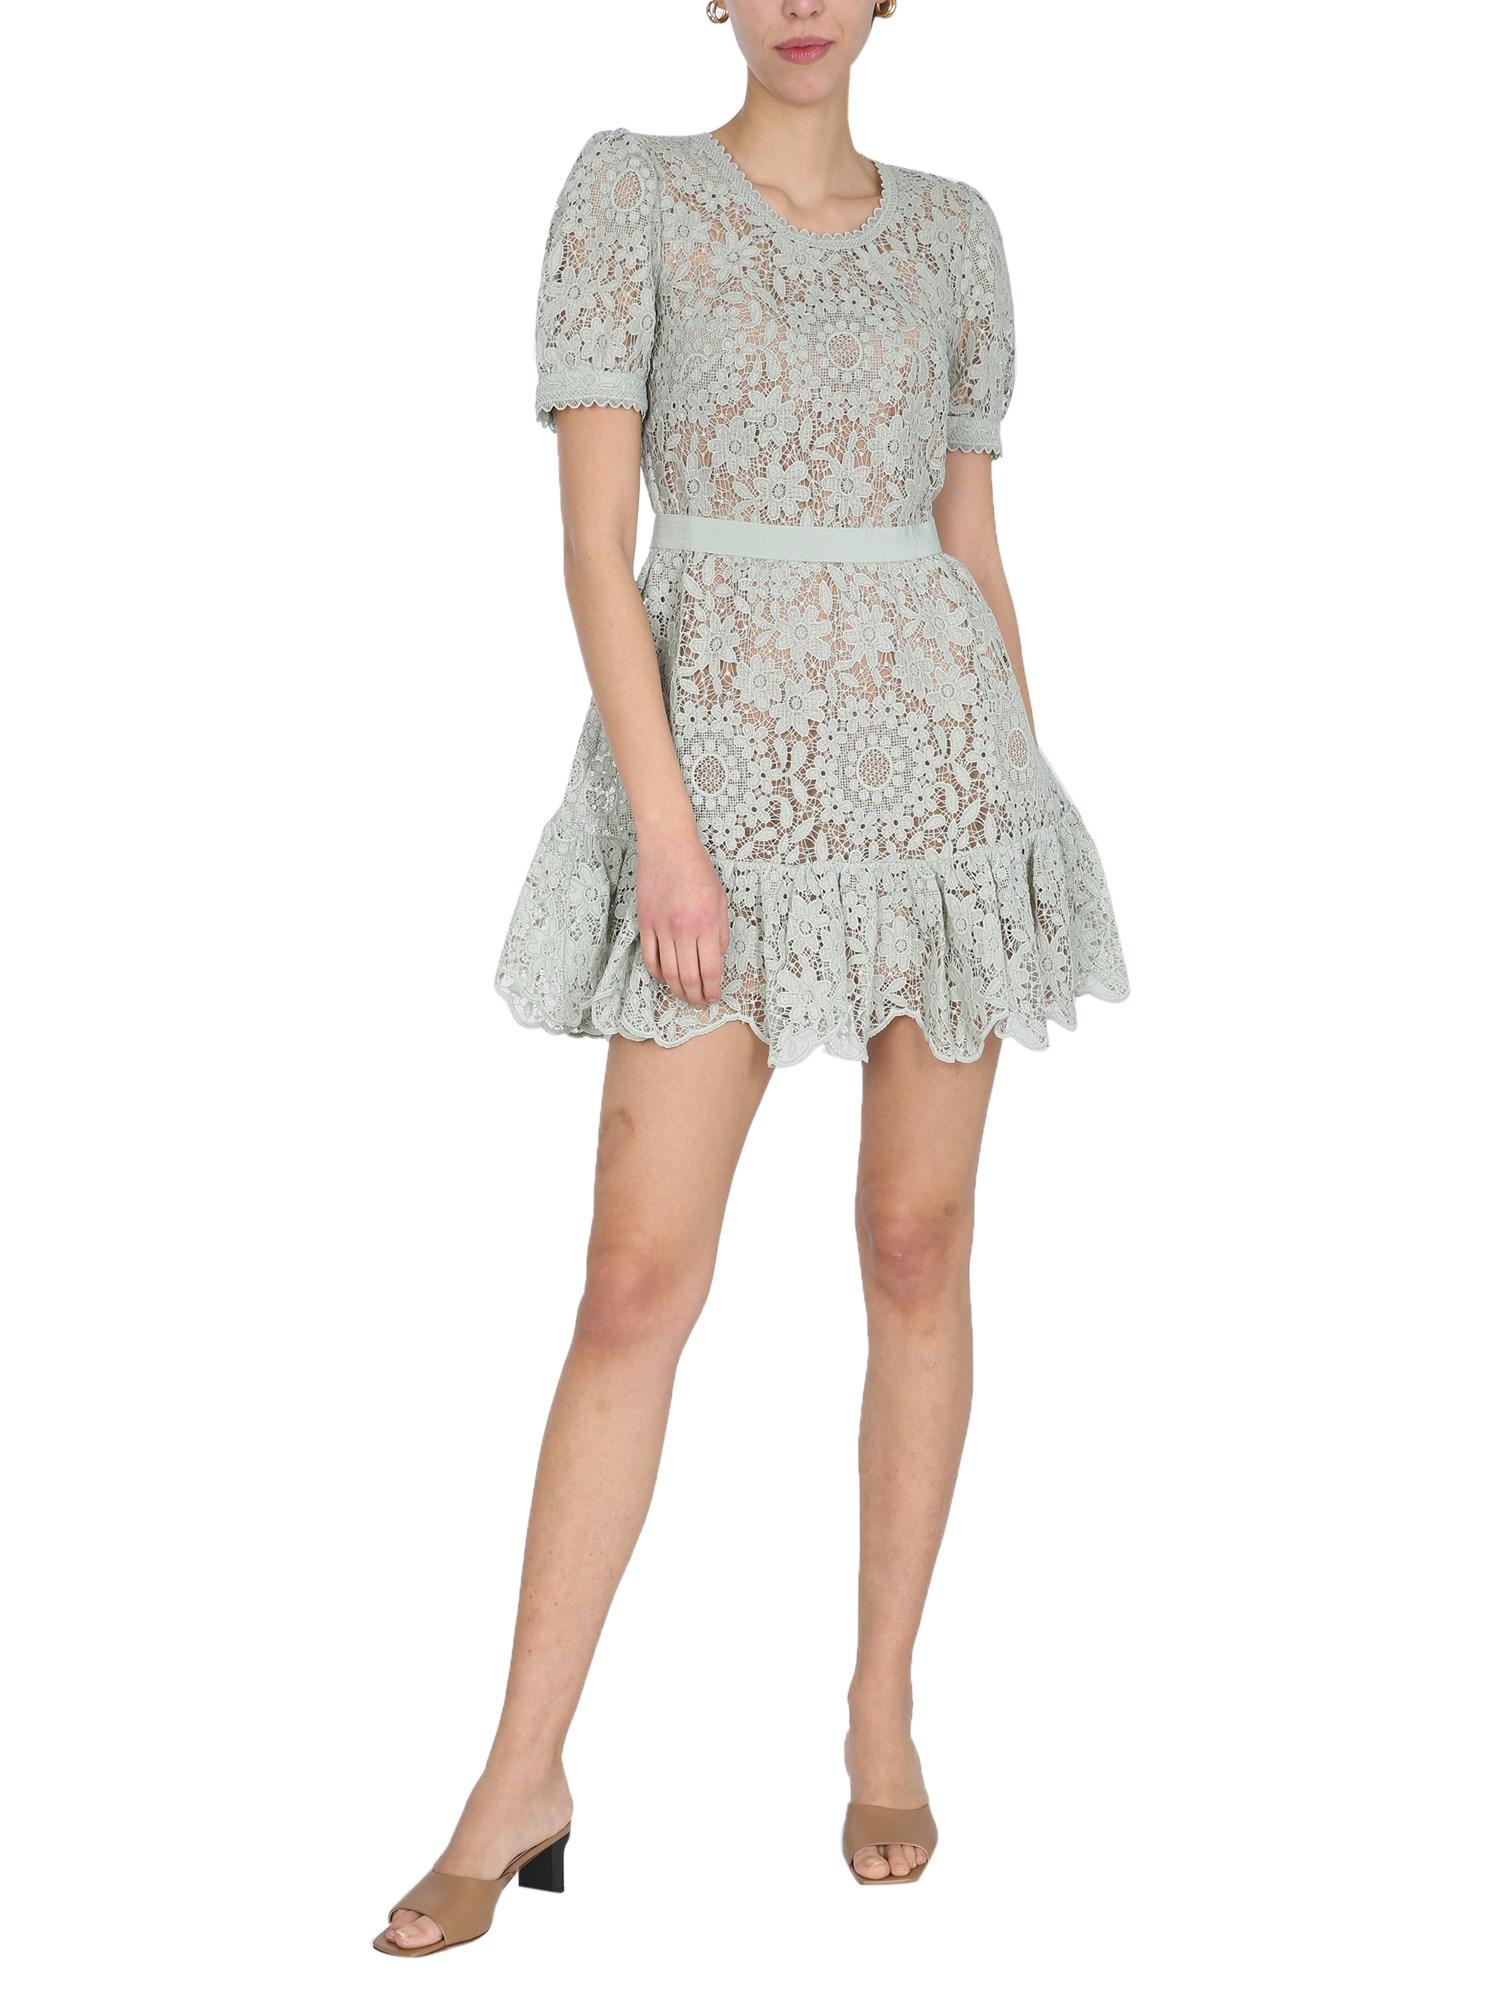 self-portrait midi guipure lace dress